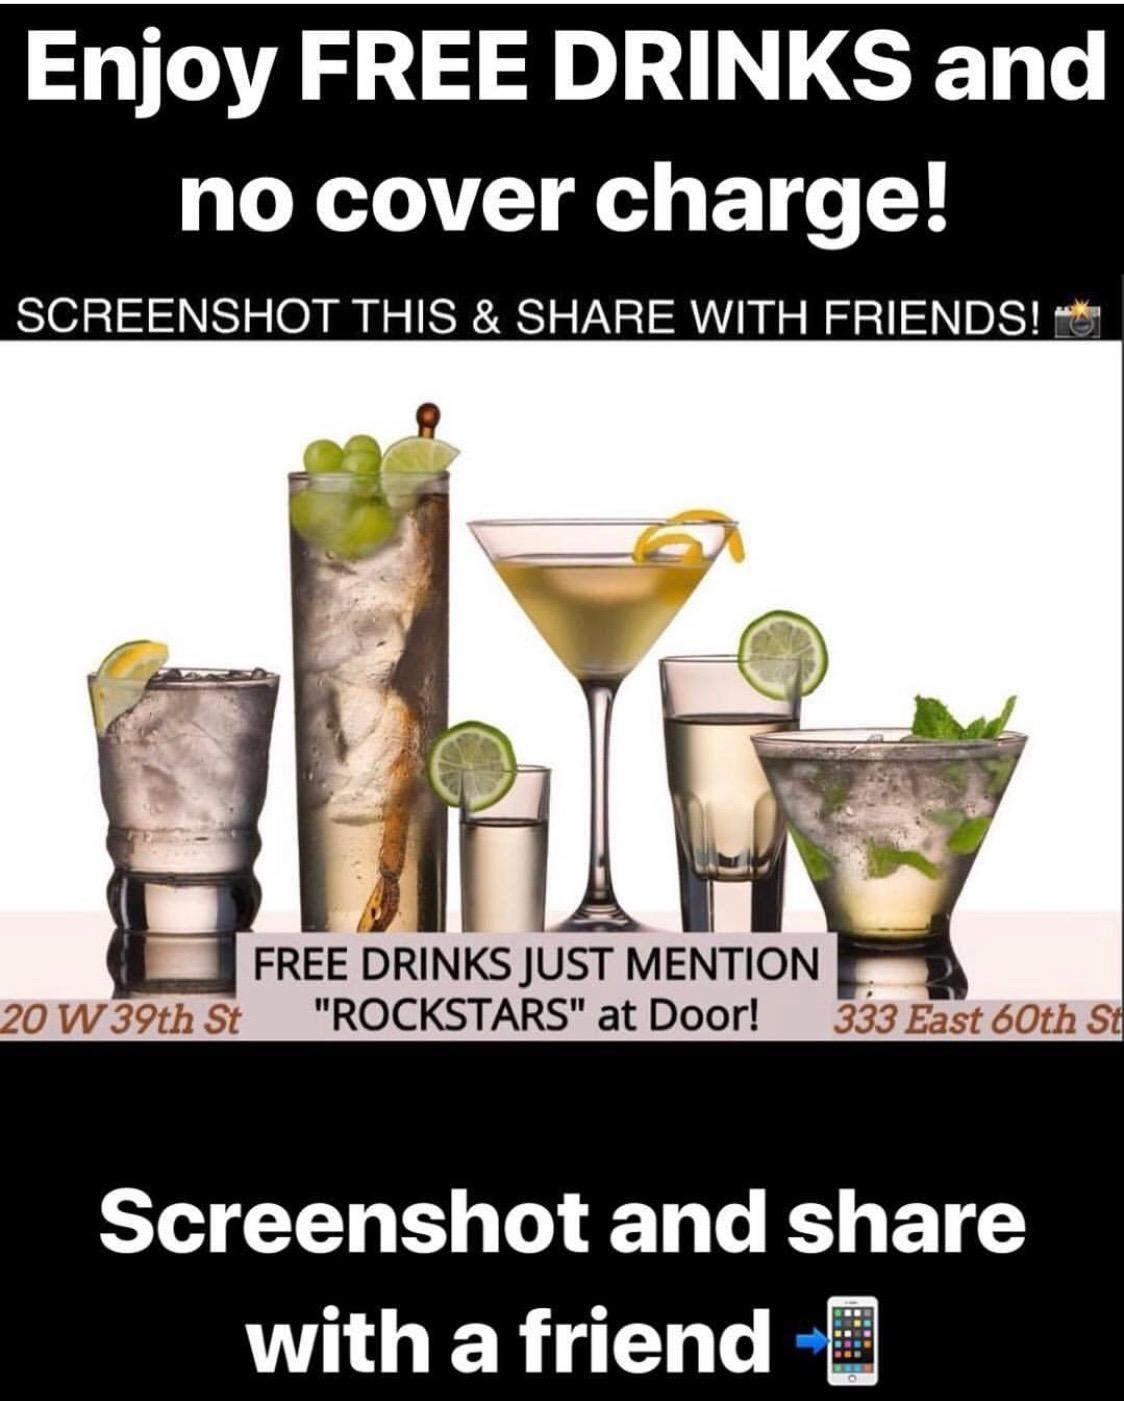 Free Drinks at 333 East 60th St or 20 W 39th St say ROCKSTARS Guestlist